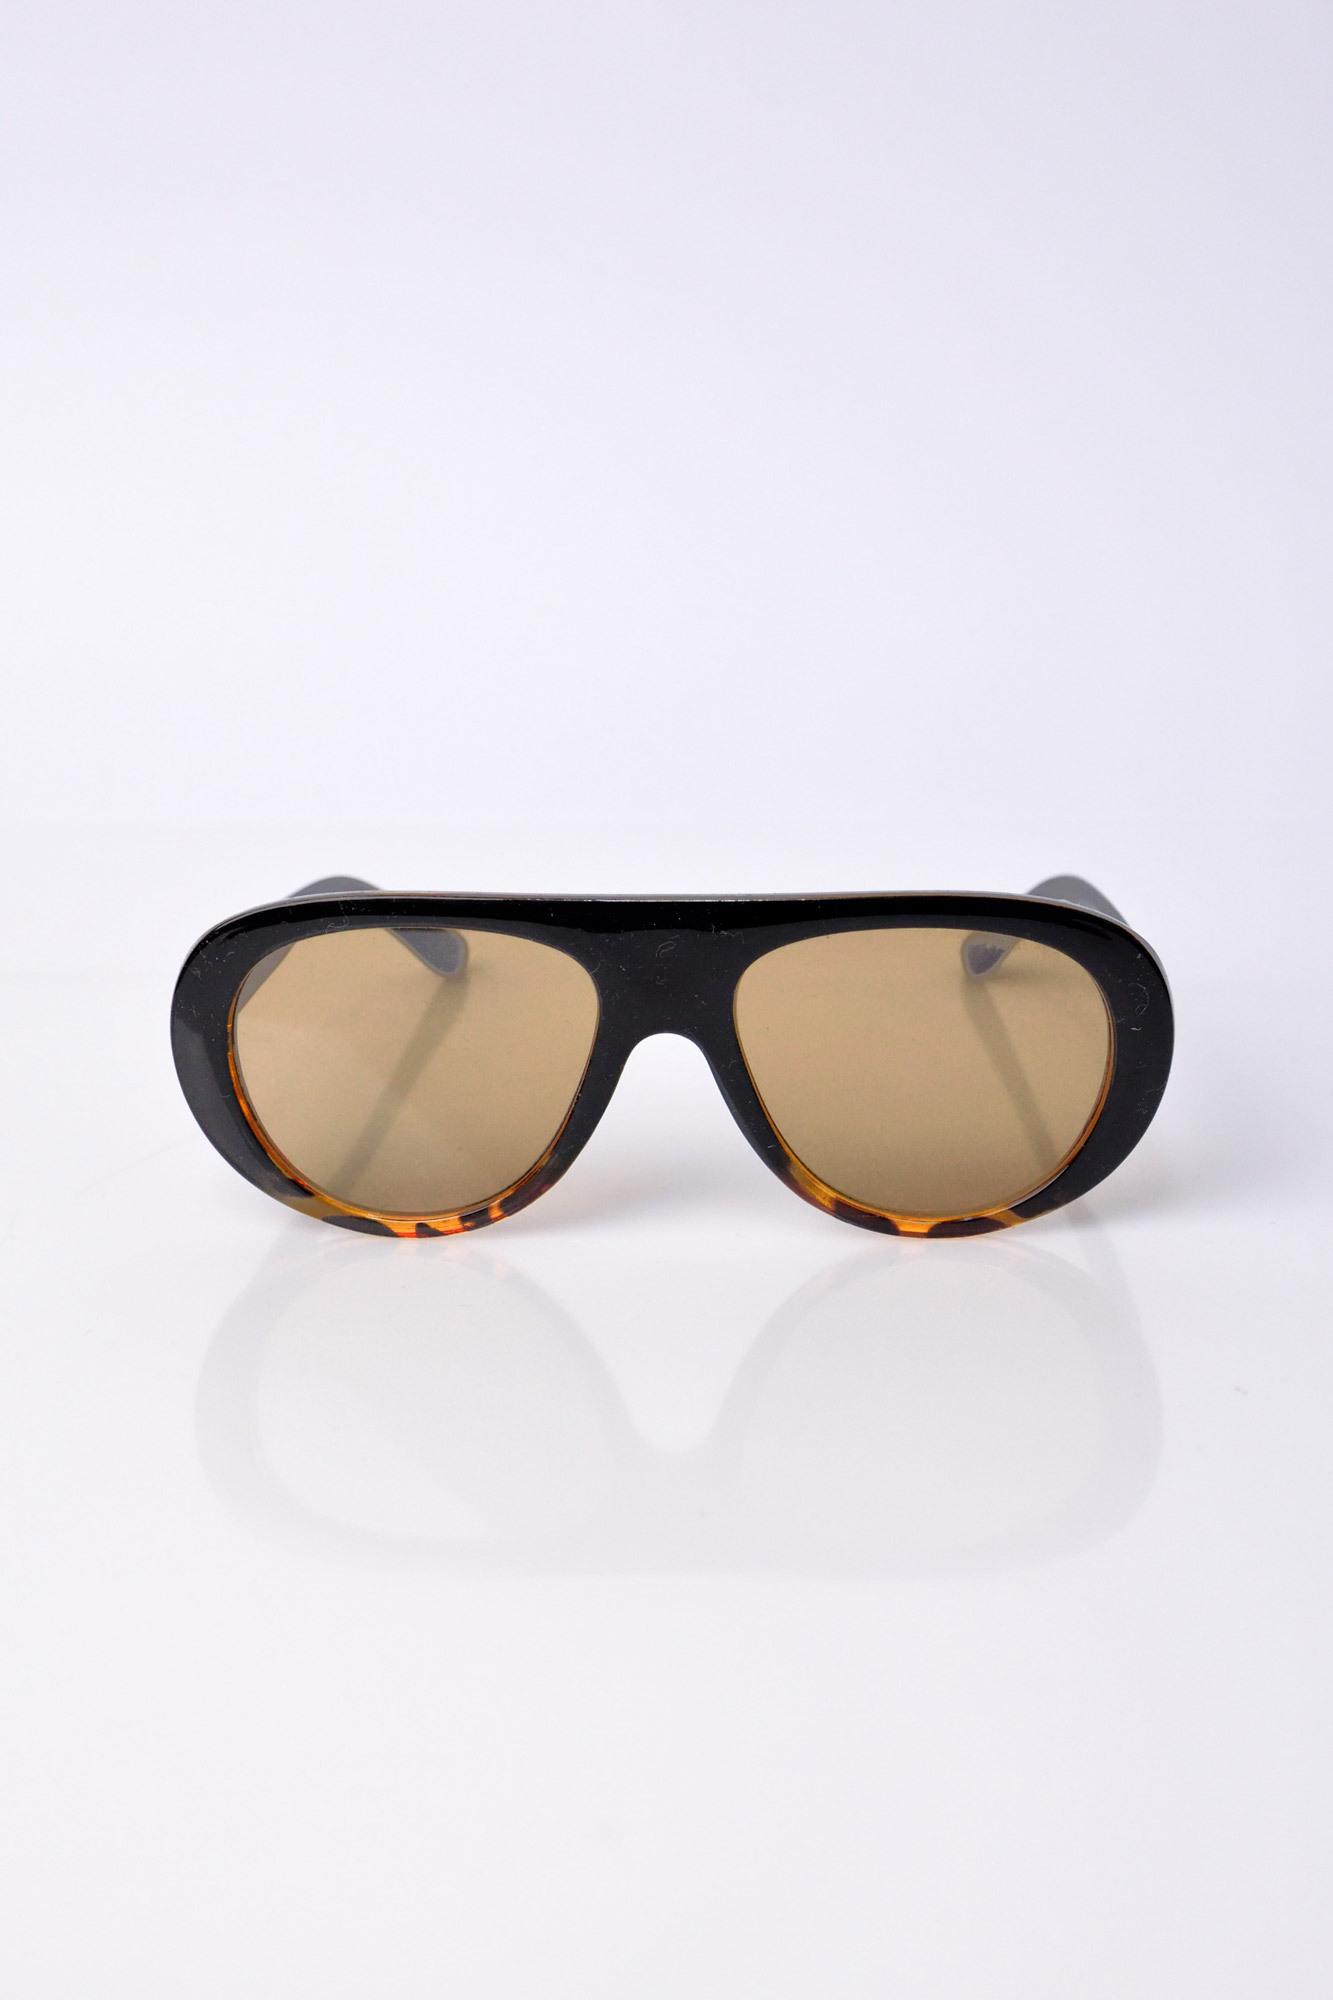 598791c0f5 Γυναικεία γυαλιά ηλίου. Touch to zoom